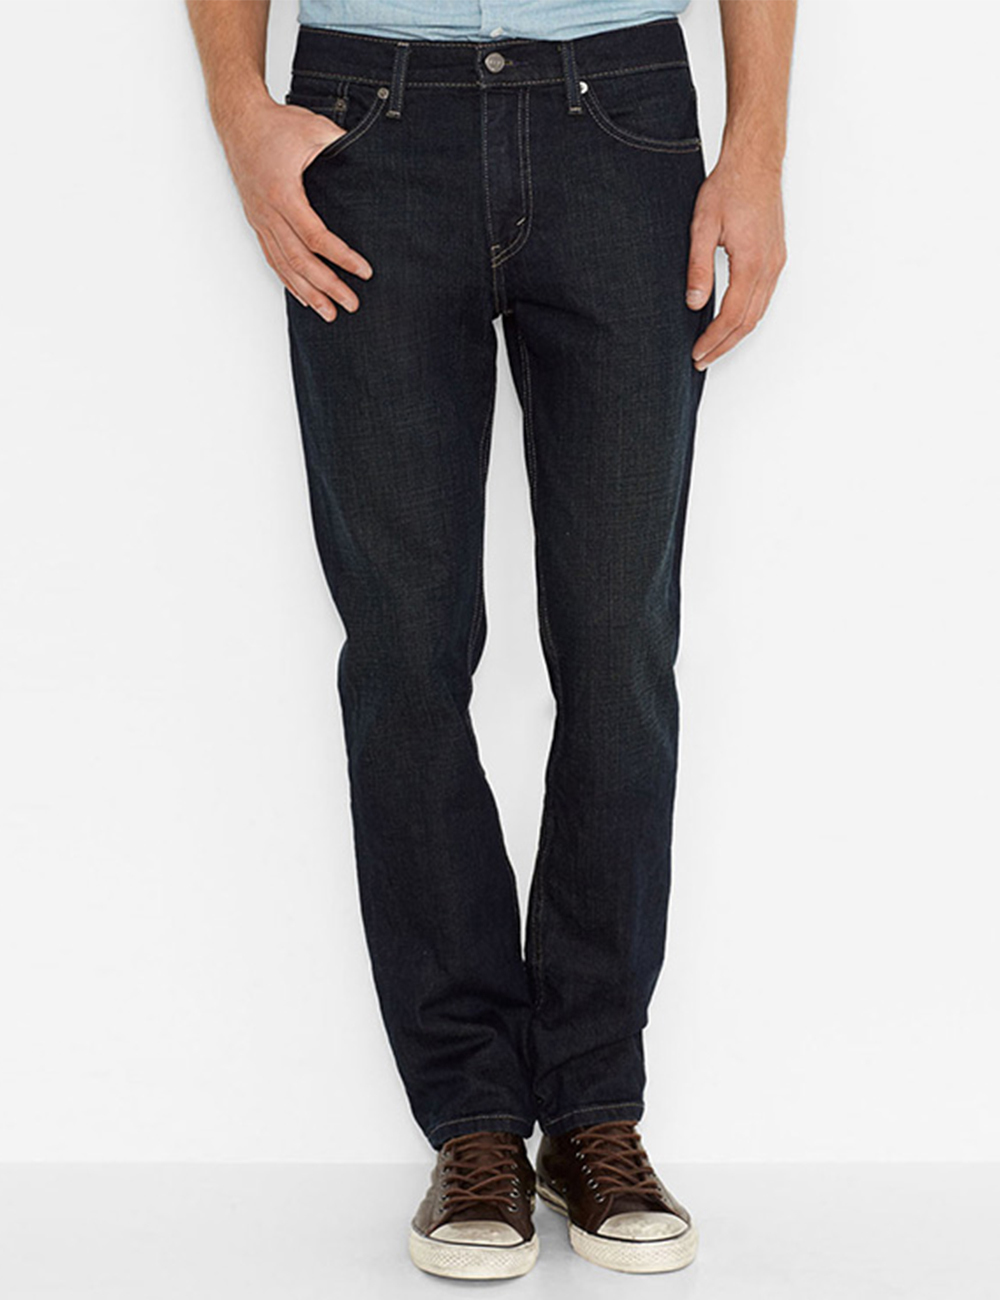 kommt an neue hohe Qualität gehobene Qualität Levi's Herren-Jeans «511», L30, blau/grün